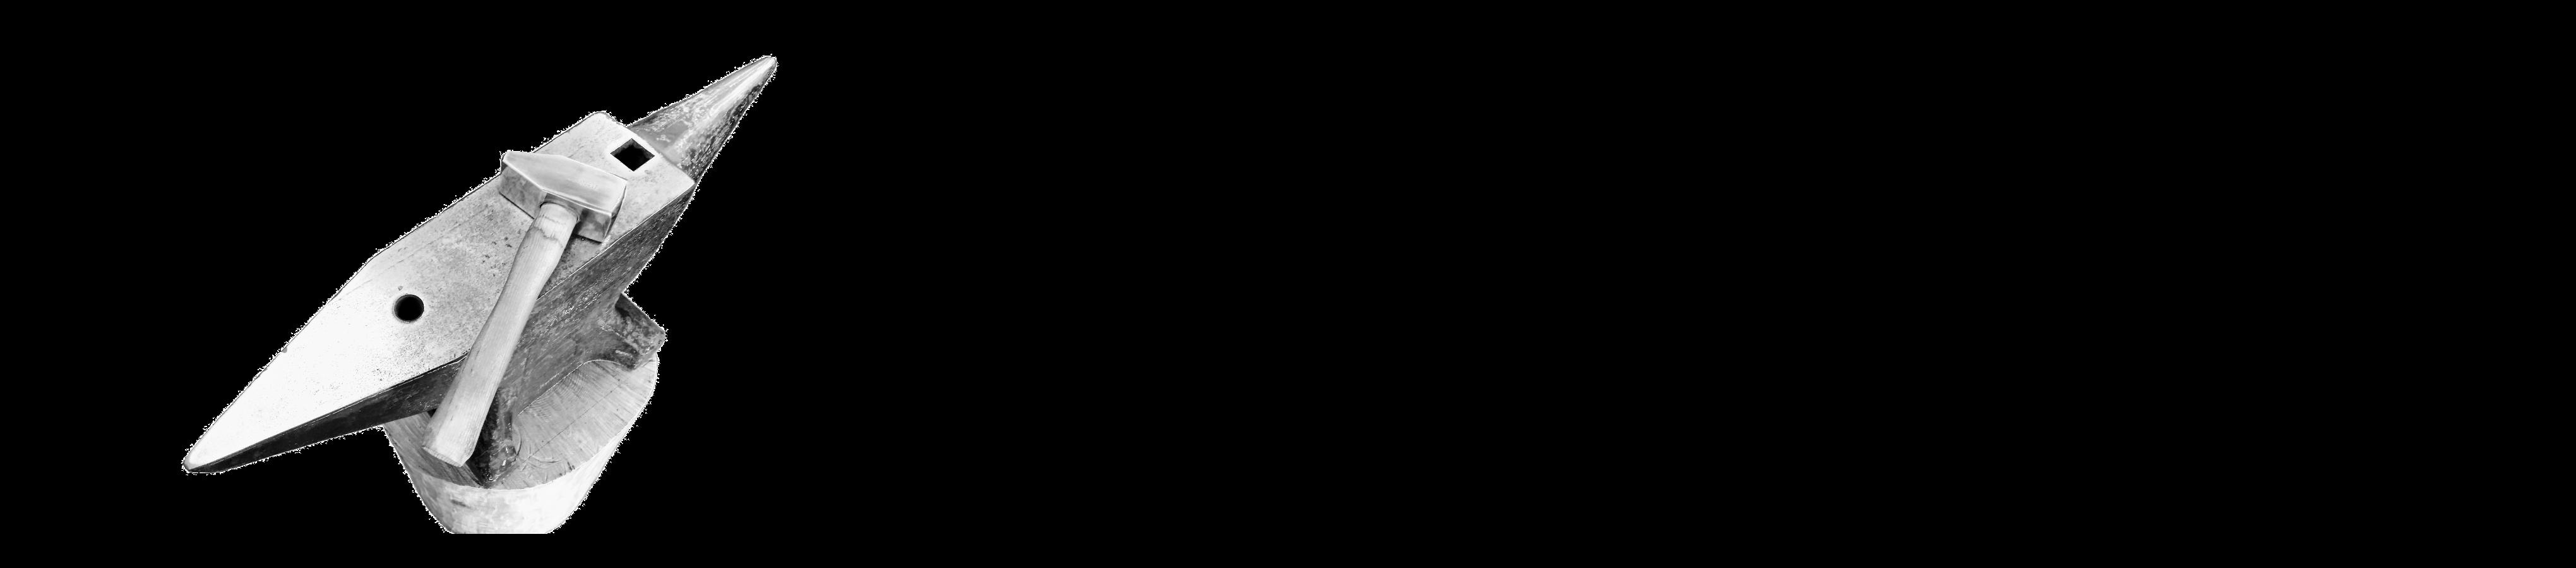 JDFerronnerie